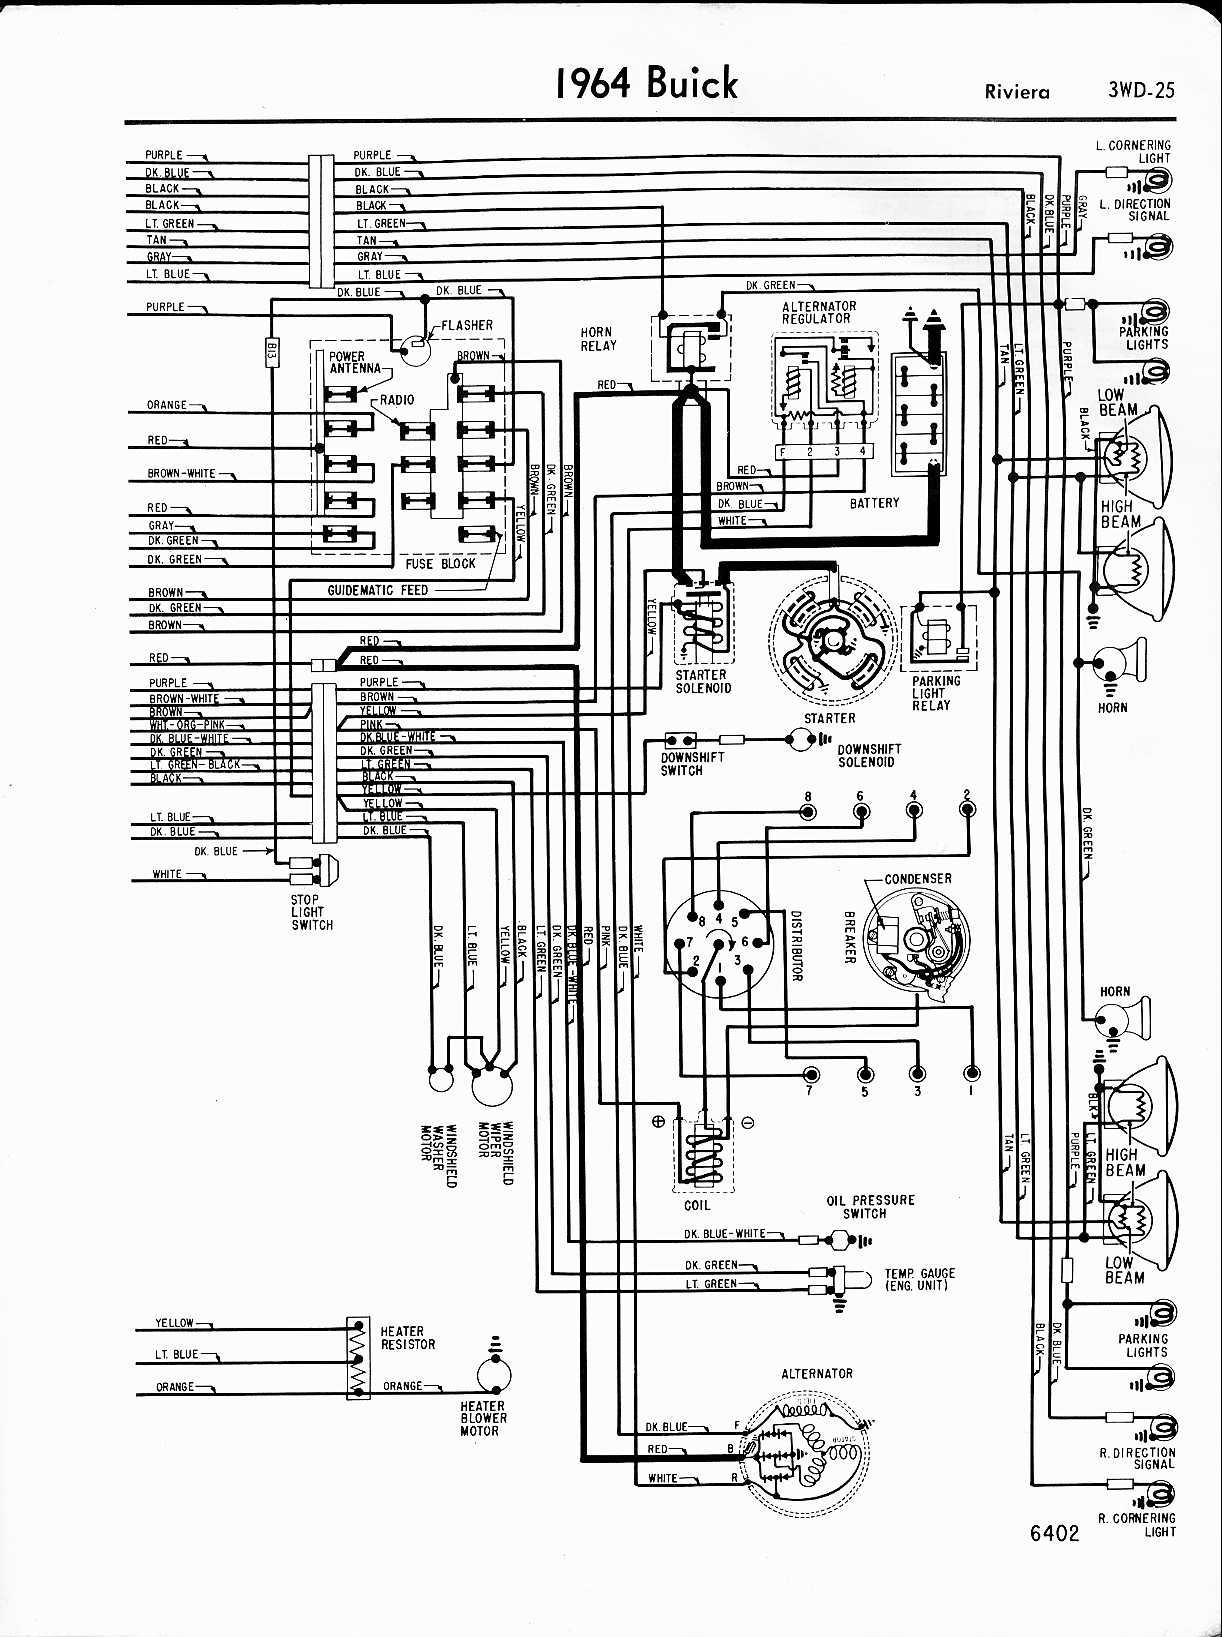 1991 pontiac grand am window diagram wiring schematic